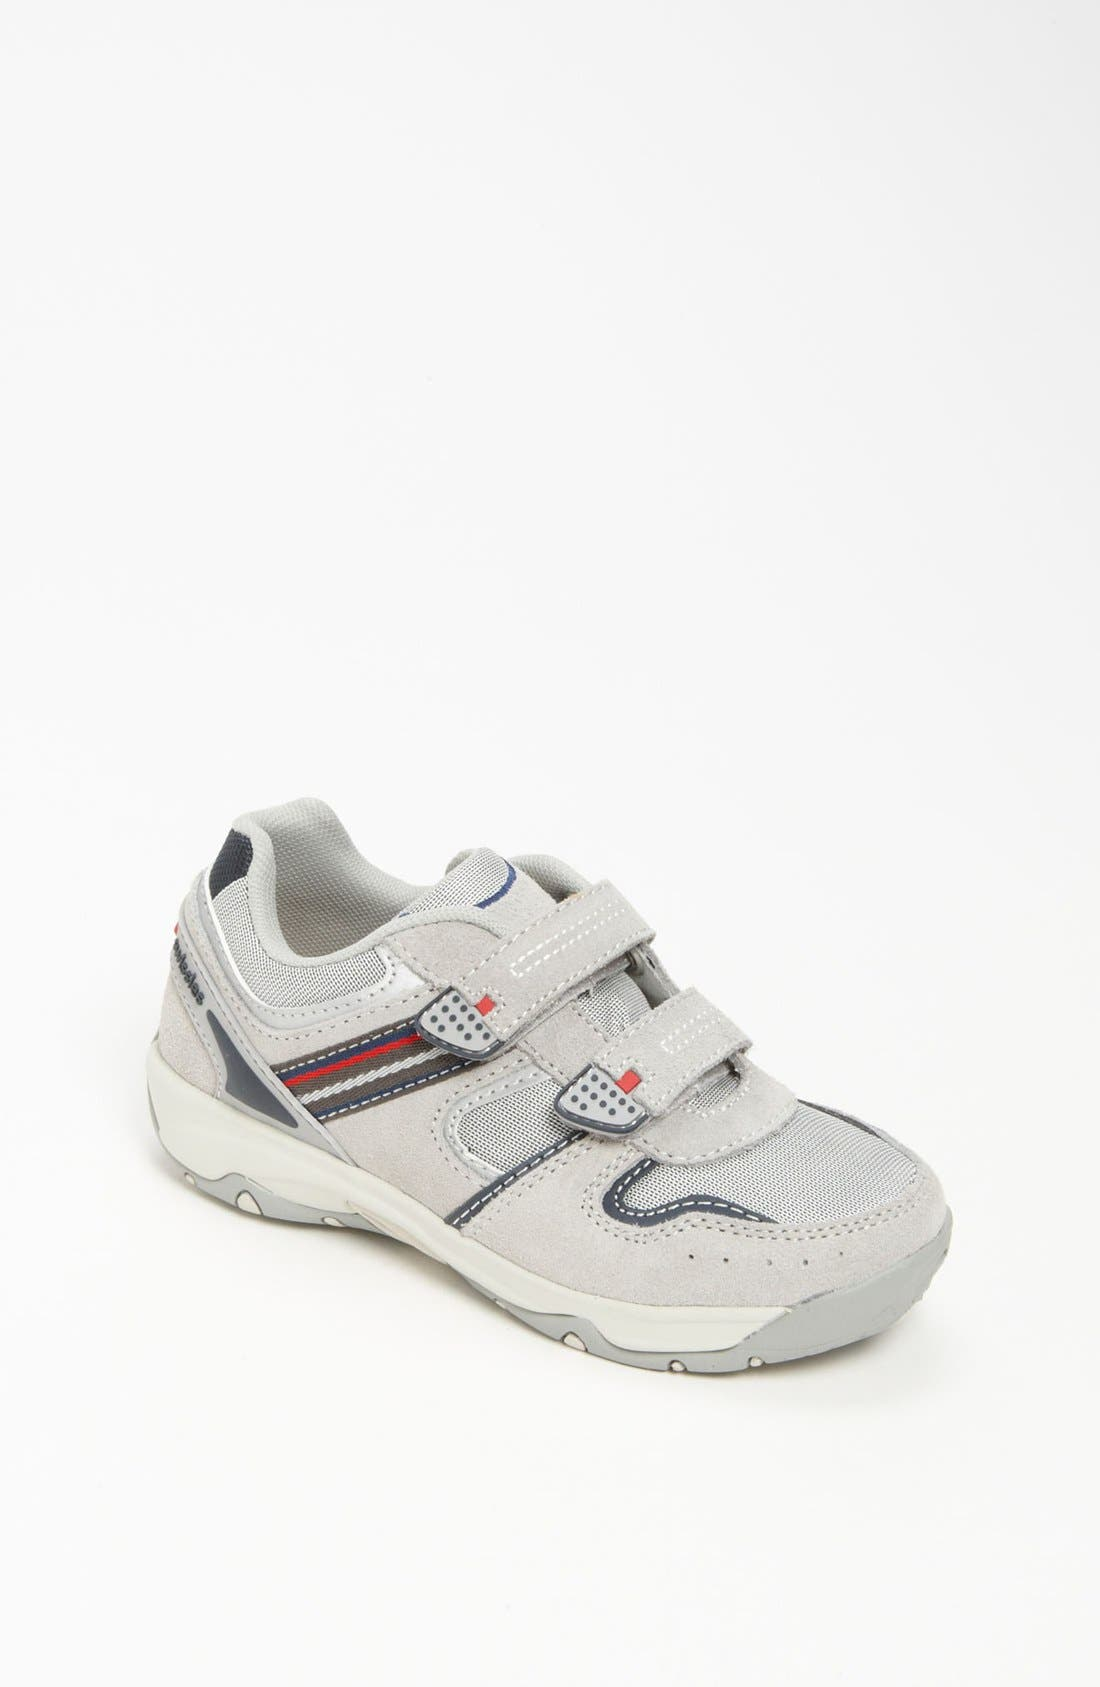 Main Image - Swissies 'Terry' Sneaker (Toddler & Little Kid)